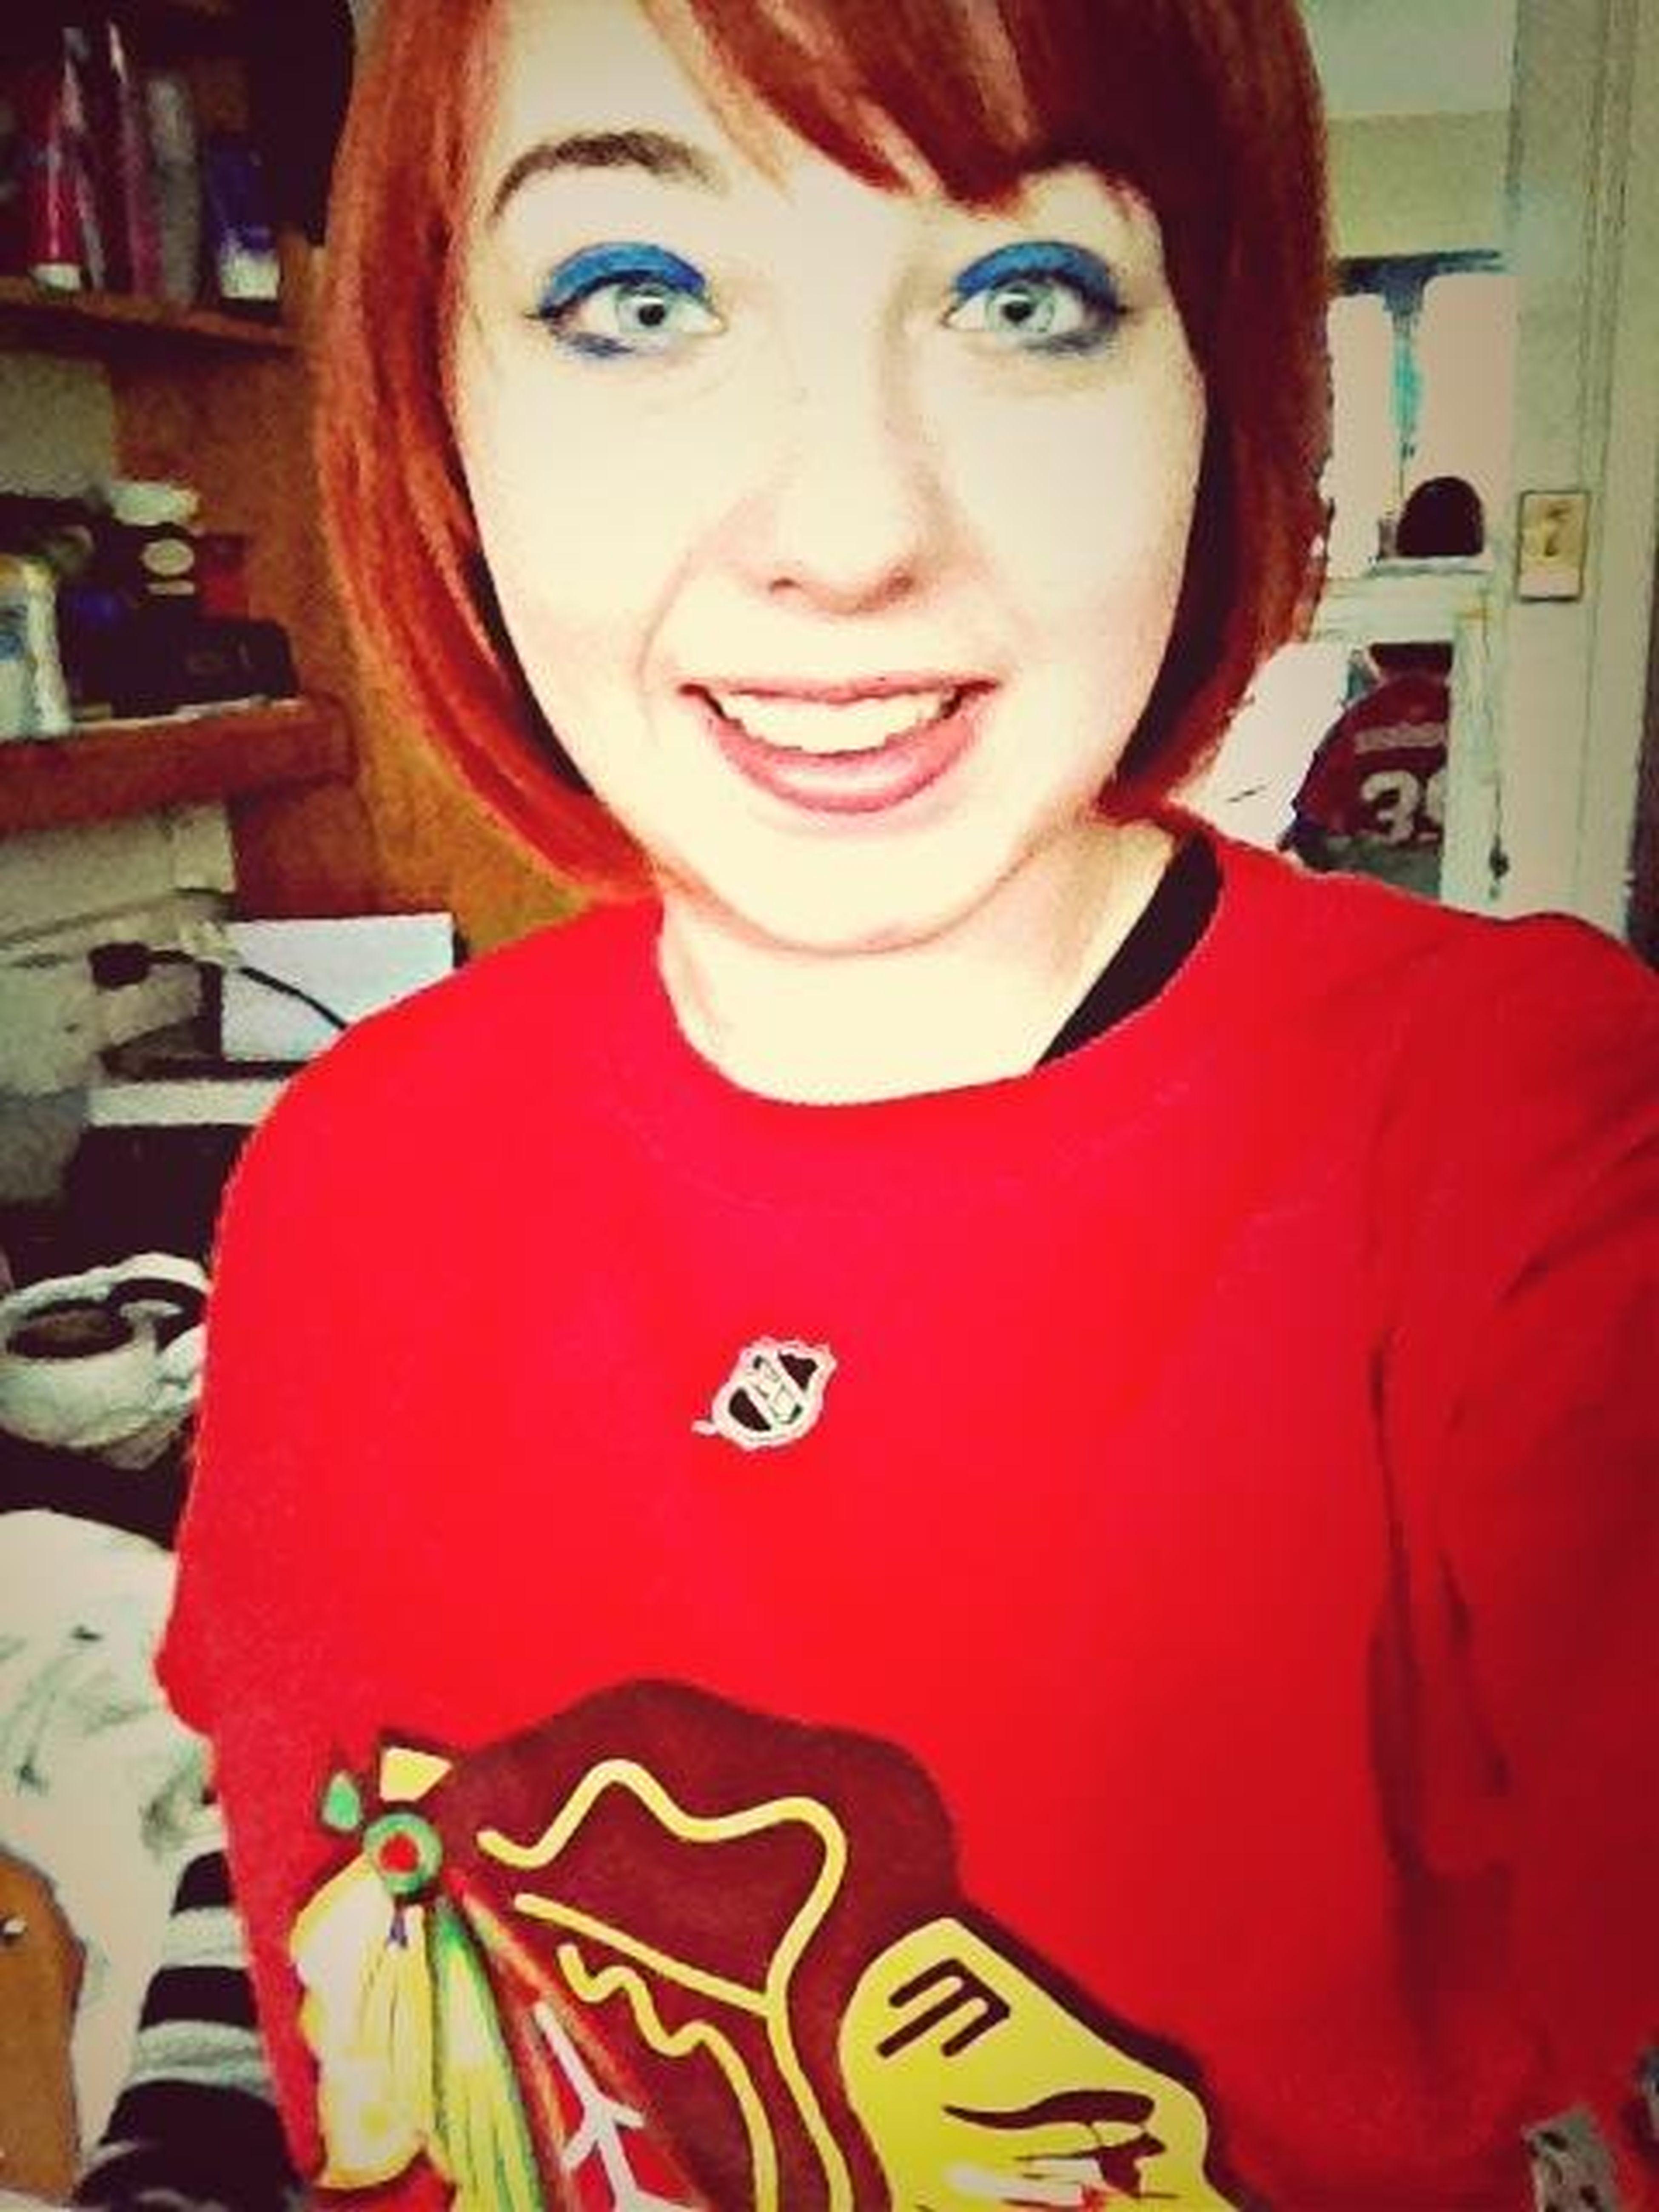 Got My Blackhawks Shirt On!